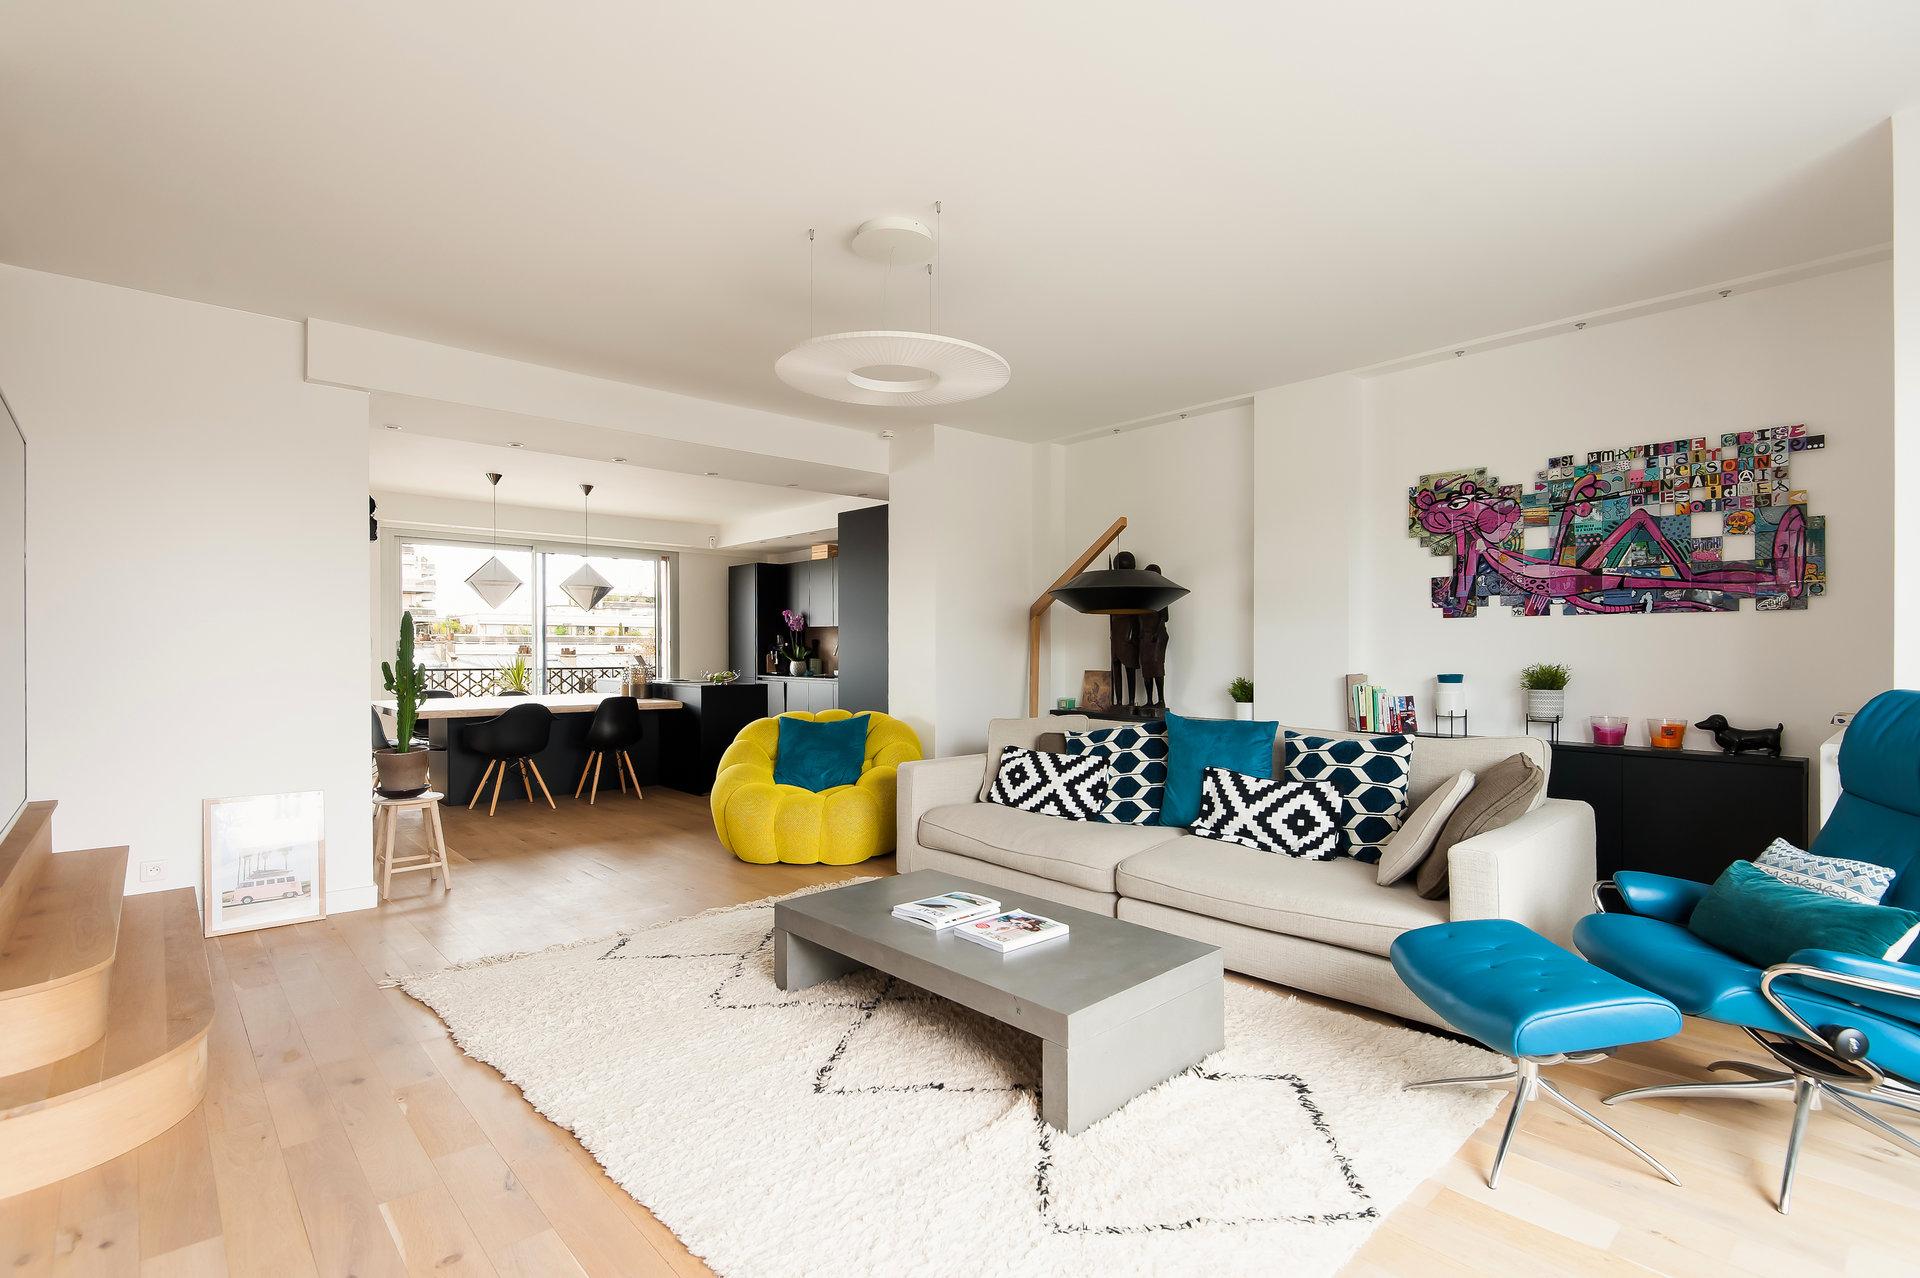 superbe-appartement-duplex-a-vendre-etex-coysevox-terrasse-vue-panoramique-parking-cave-abri-velo